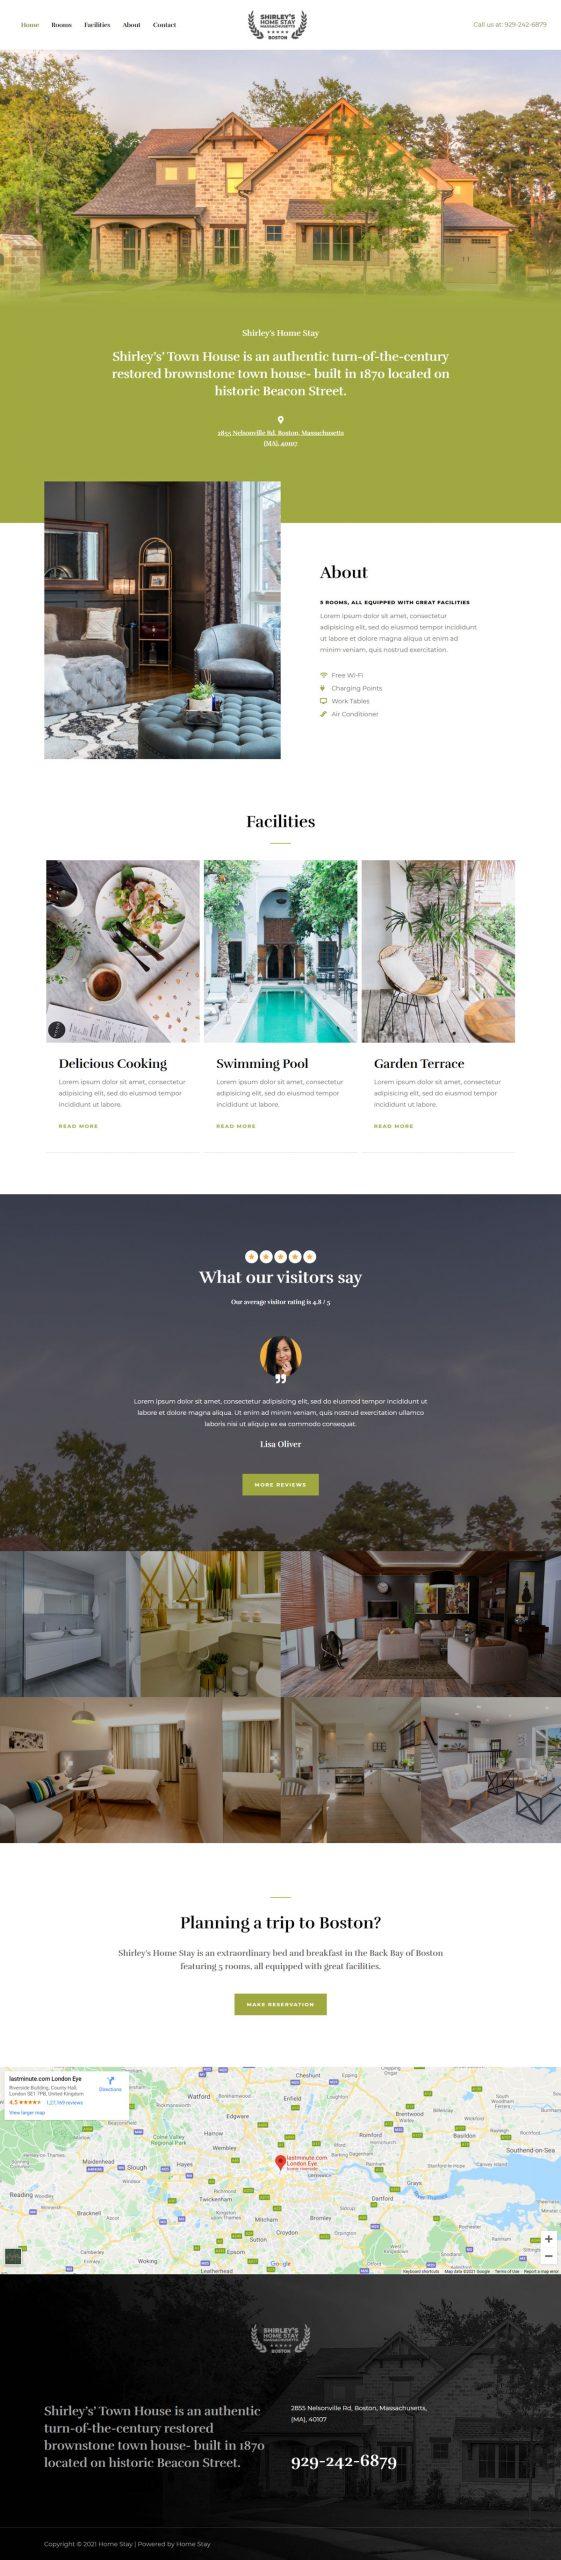 Adamo Web Design | Web Design Durham | home stay 02 home scaled